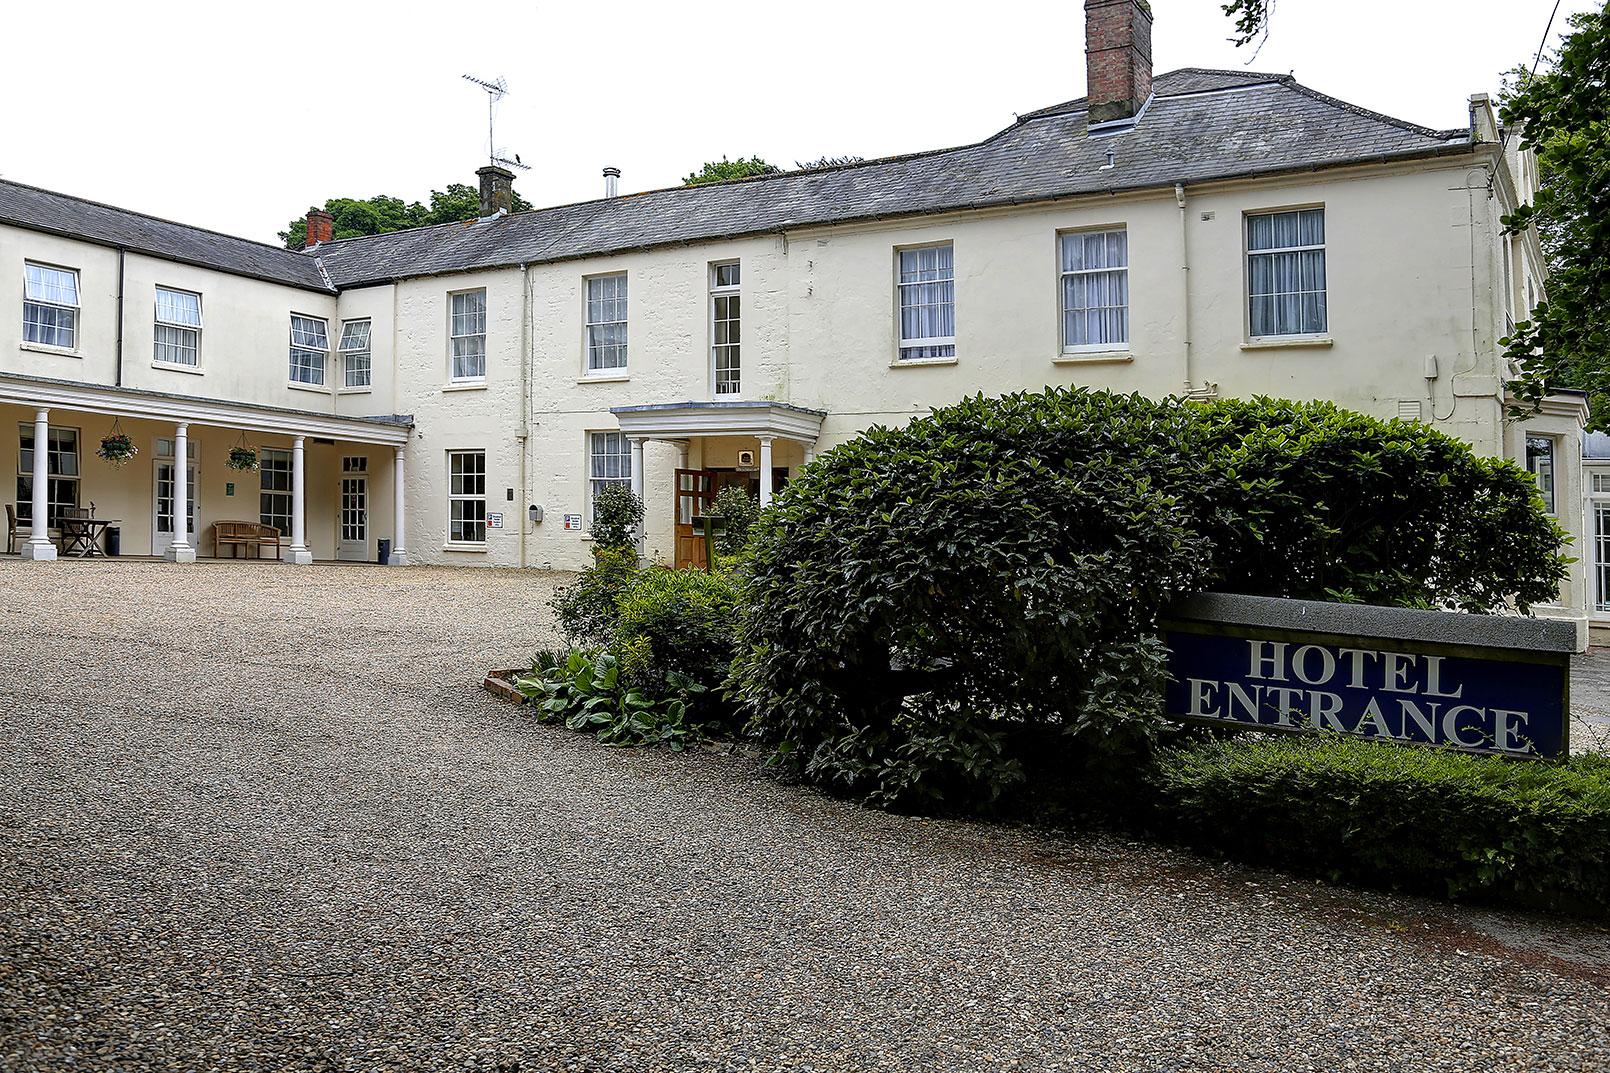 Royal Chase Hotel Shaftesbury